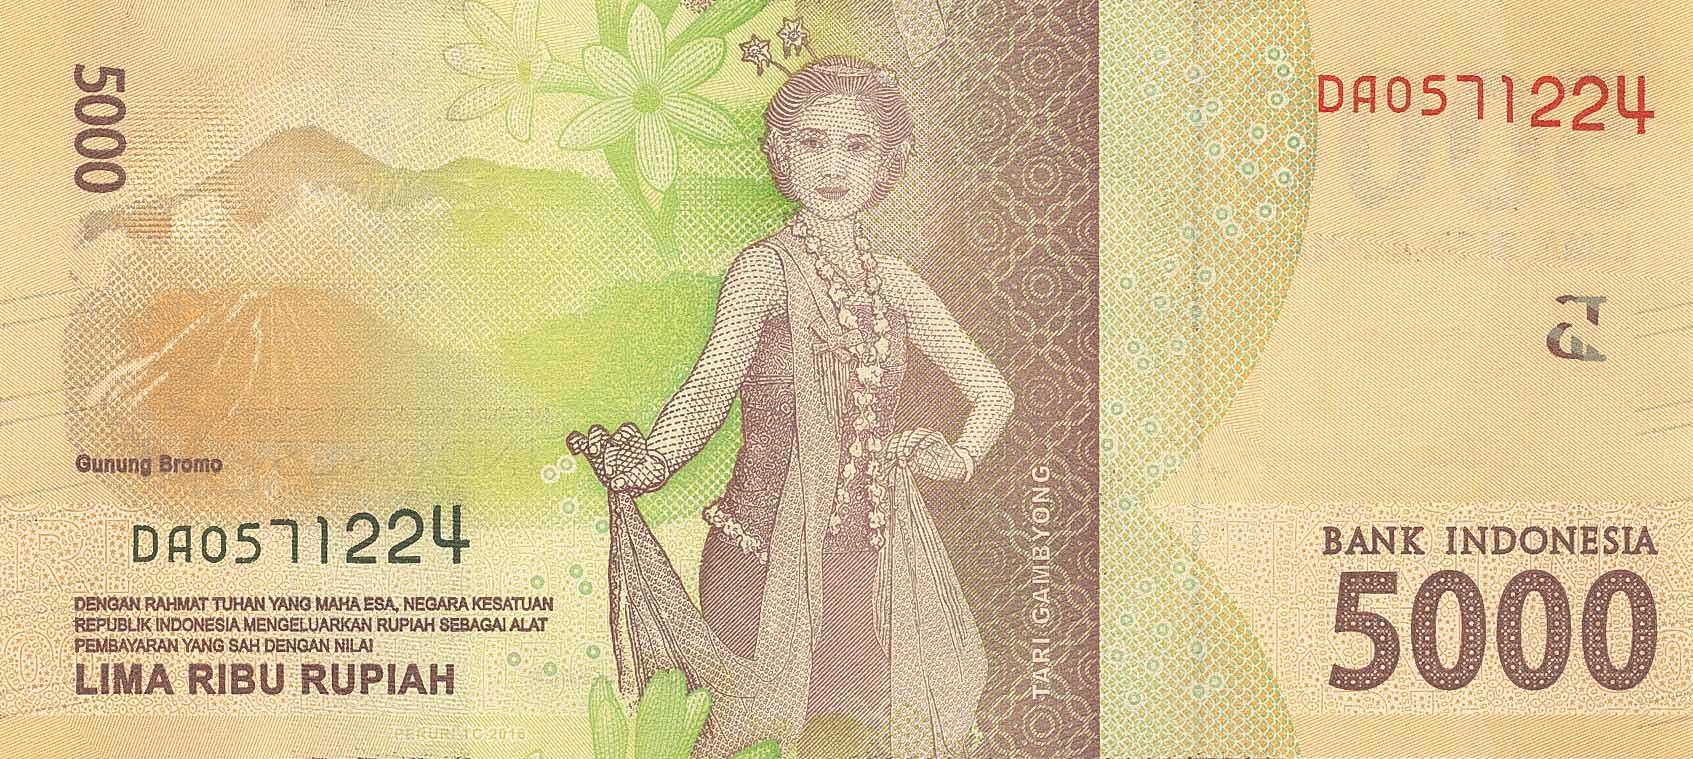 IDN-0156a-5000-Rupiah-2016-HLG-b